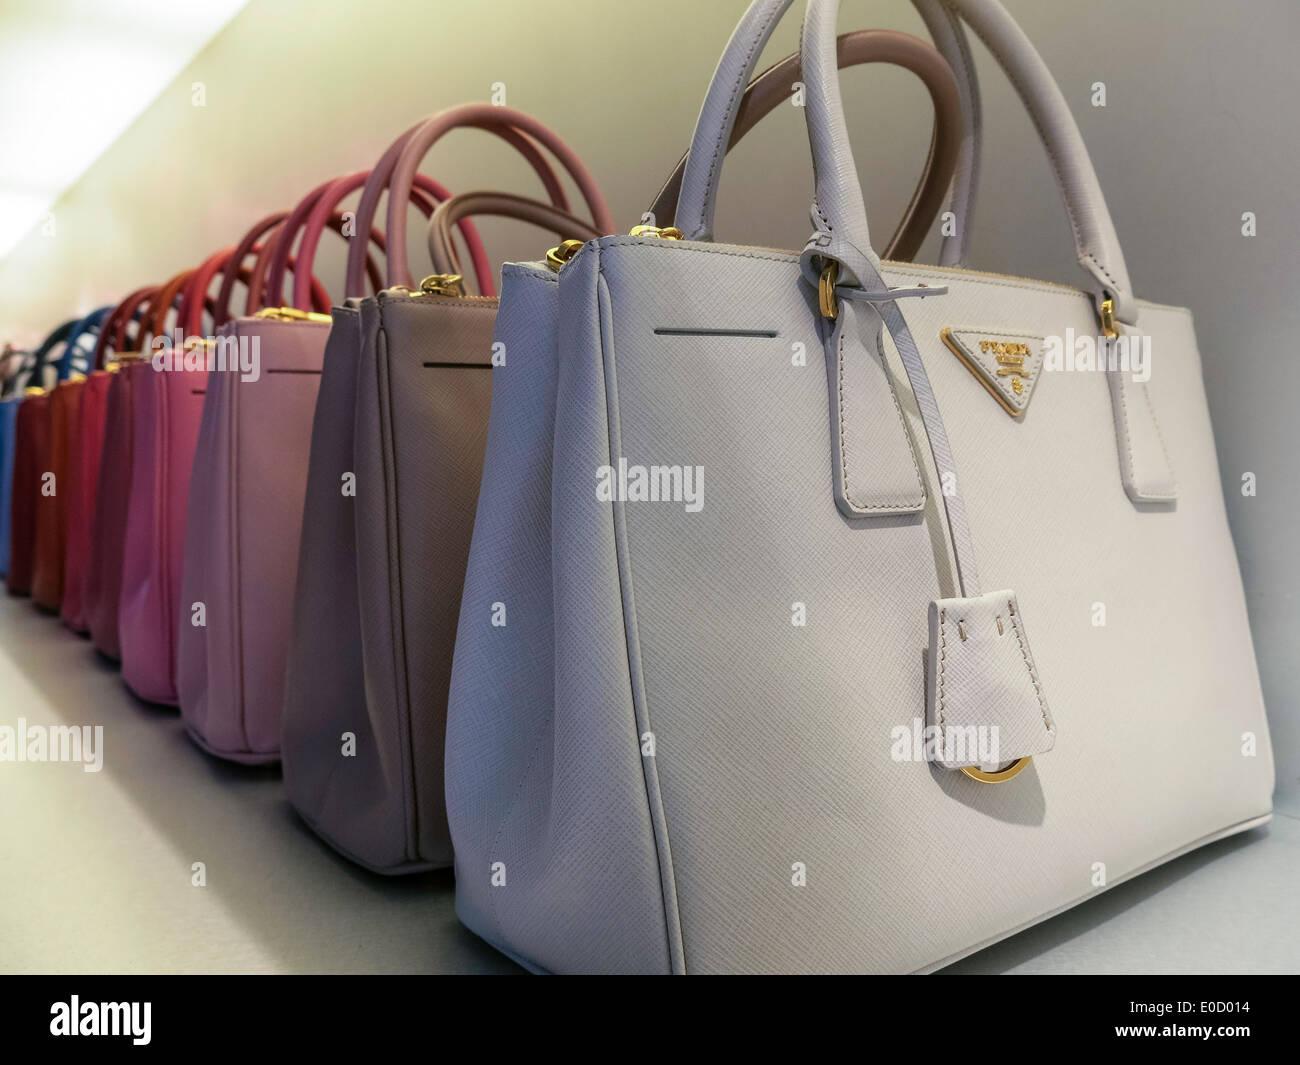 c754edf6bdeb Prada Handbag Stock Photos & Prada Handbag Stock Images - Alamy